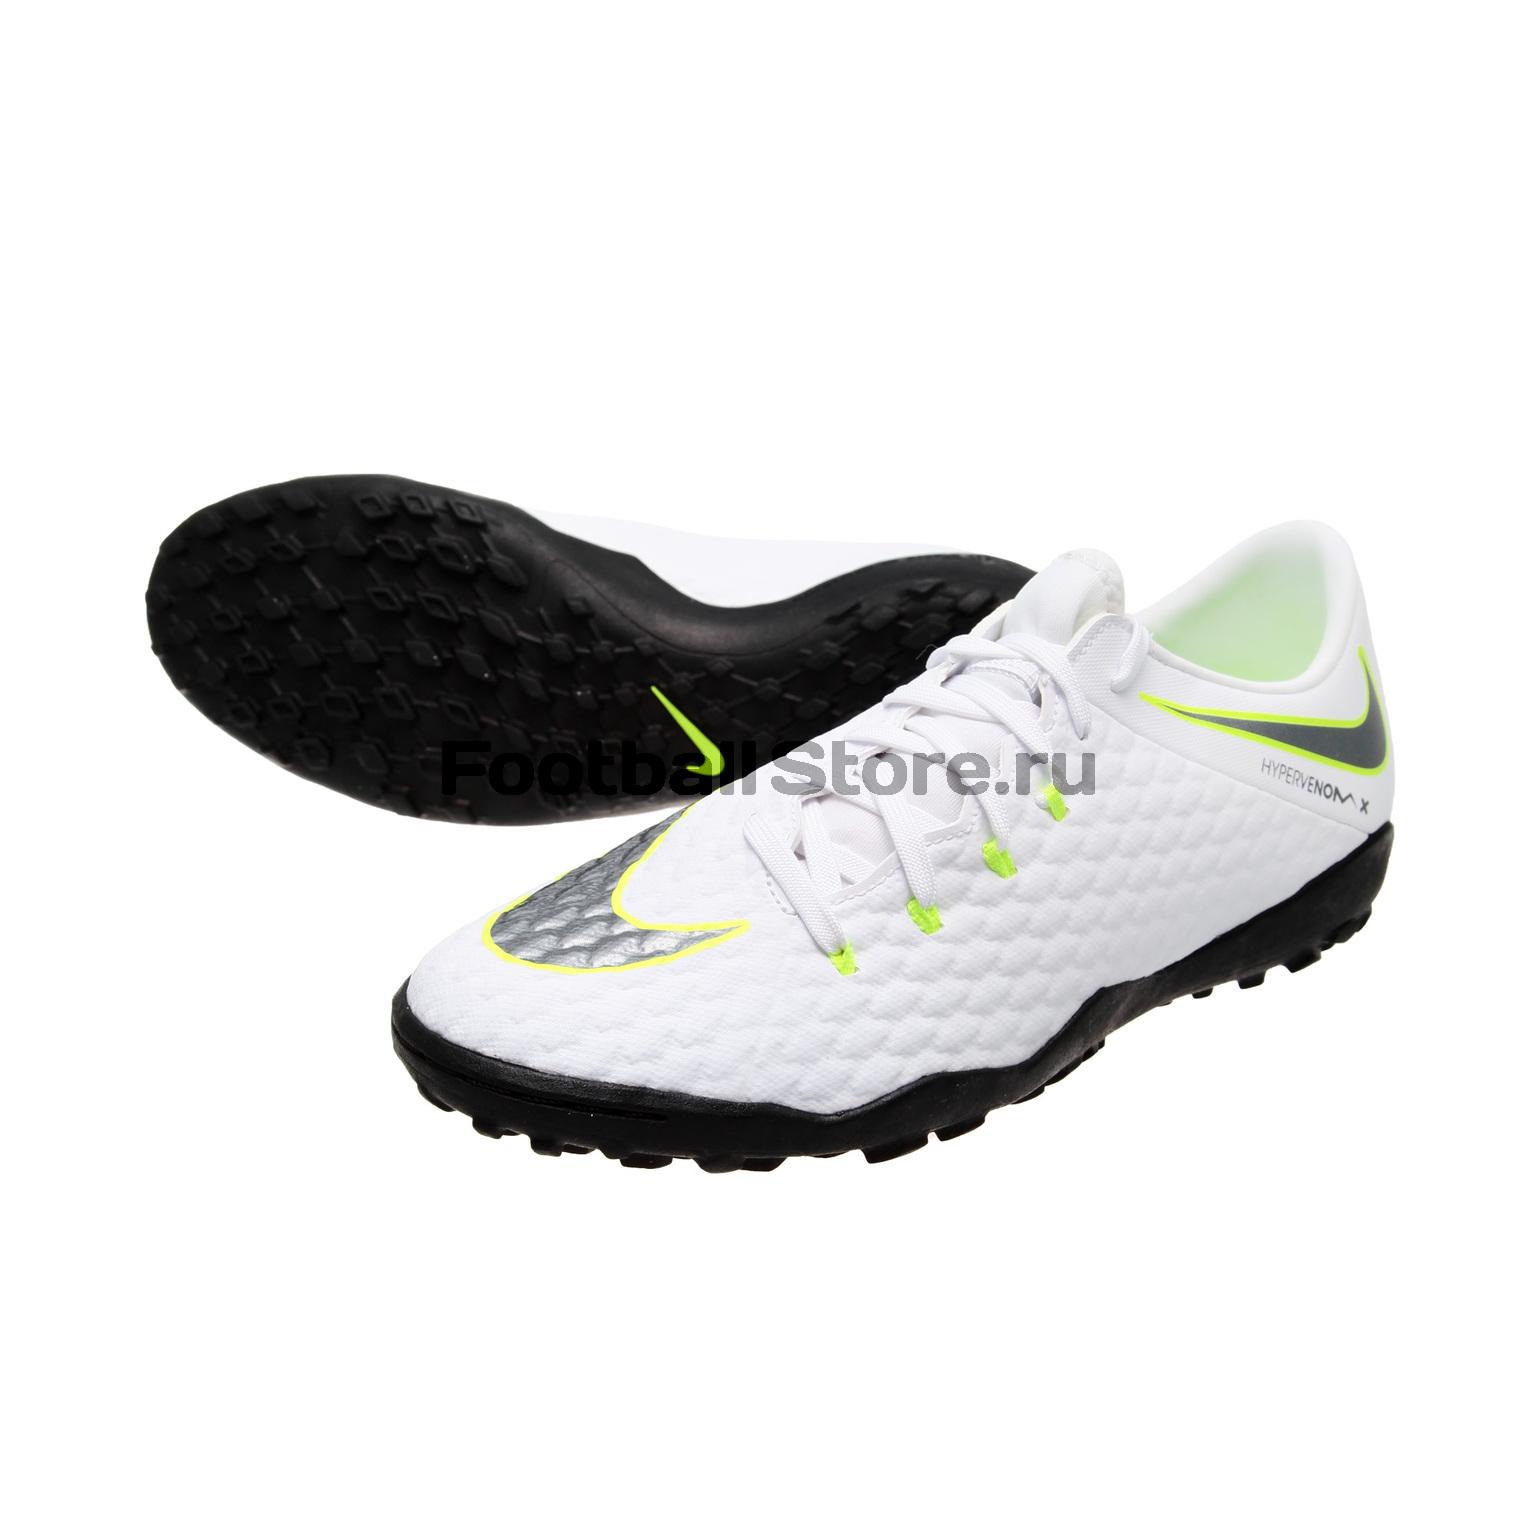 Шиповки Nike Hypervenom 3 Academy TF AJ3815-107 бутсы nike шиповки nike jr tiempox legend vi tf 819191 018